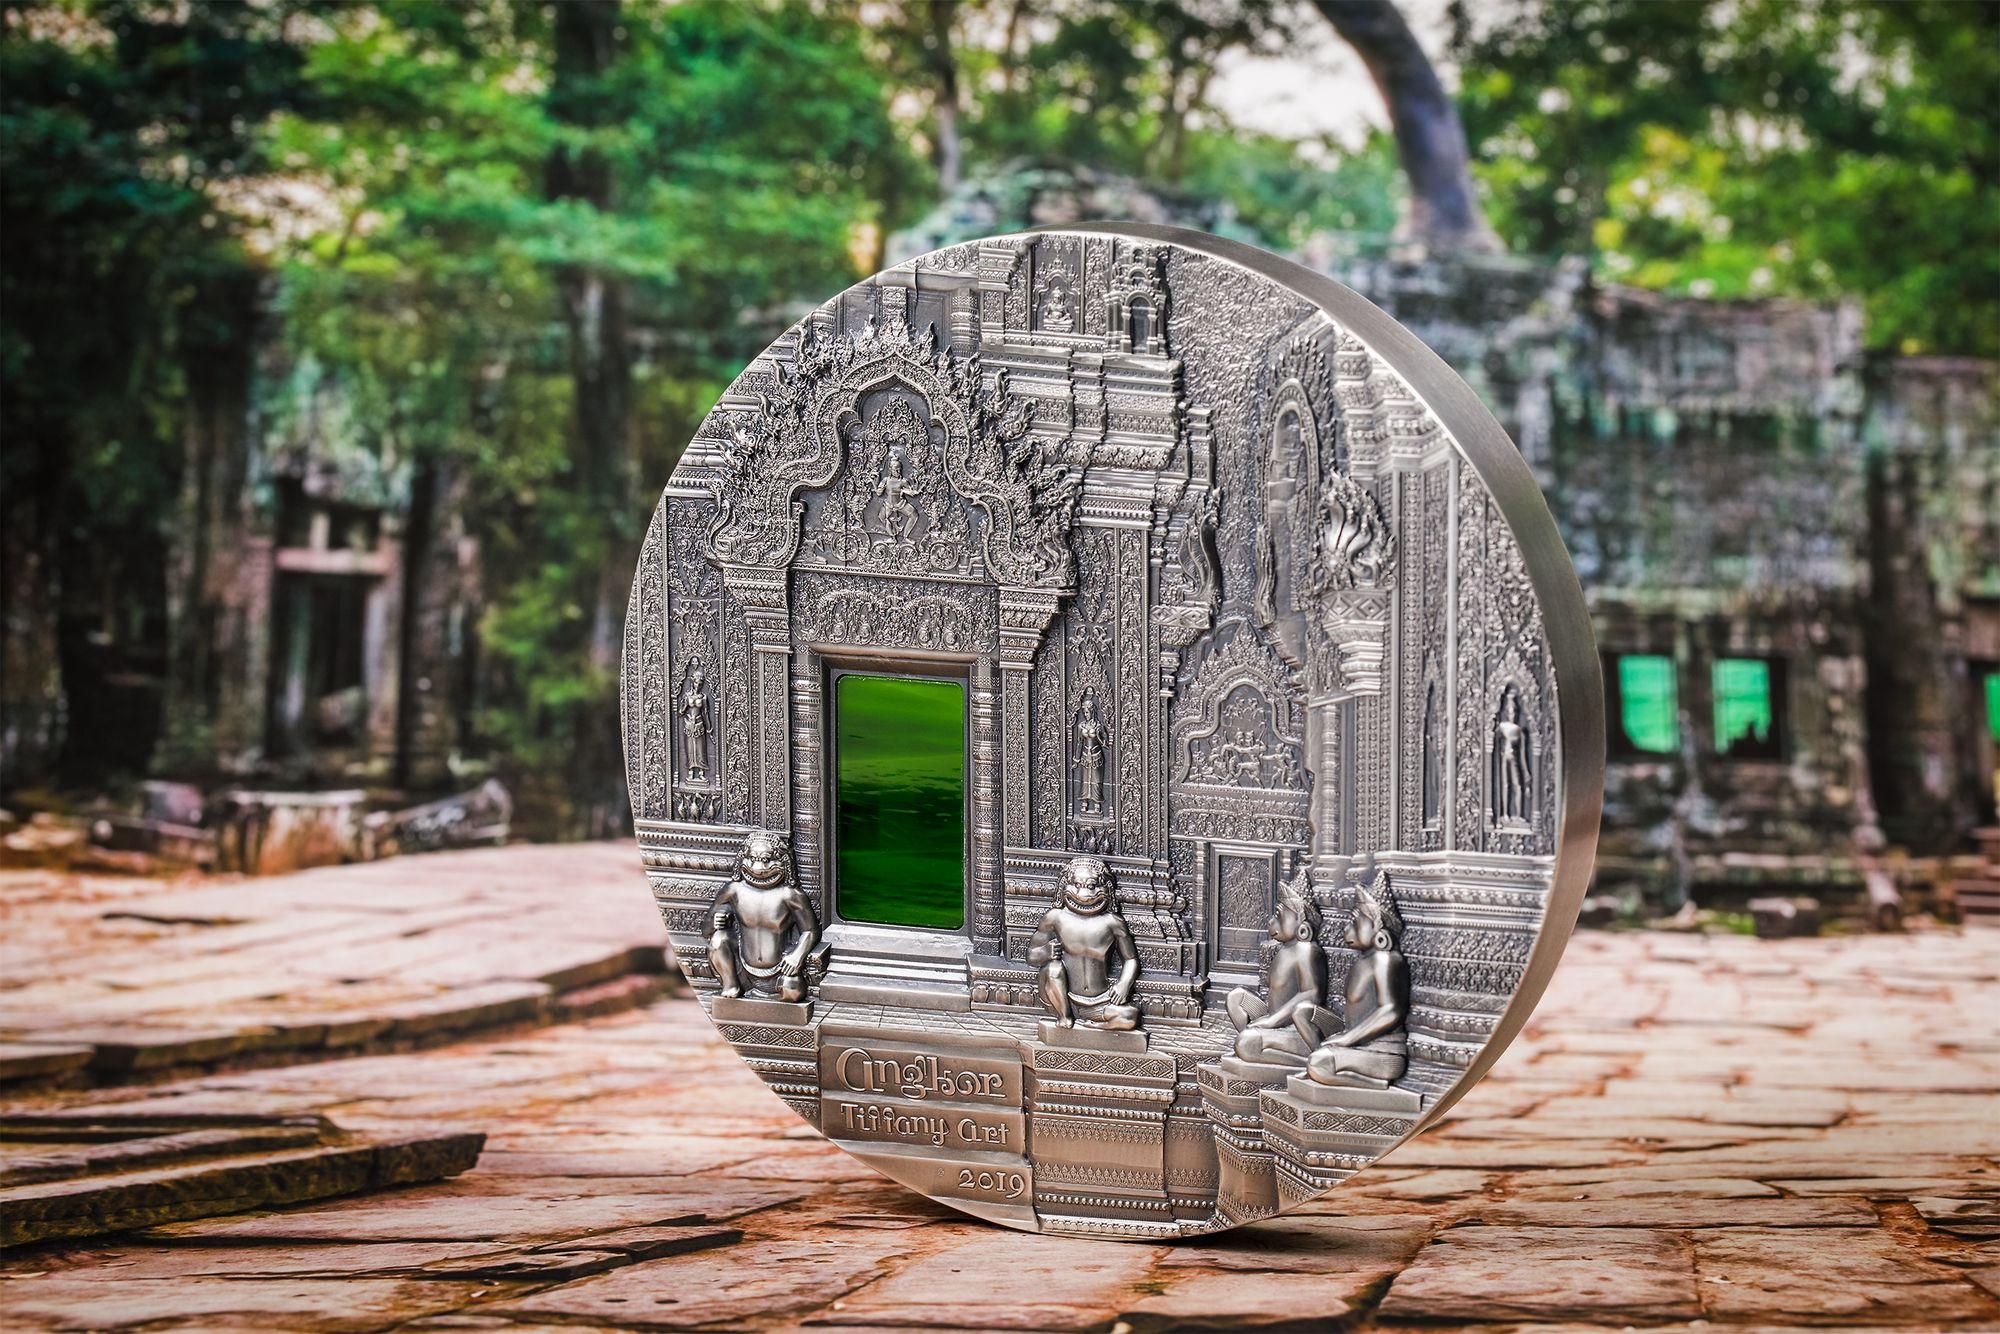 2019 Tiffany Art Angkor 1 Kilo Silver Coin